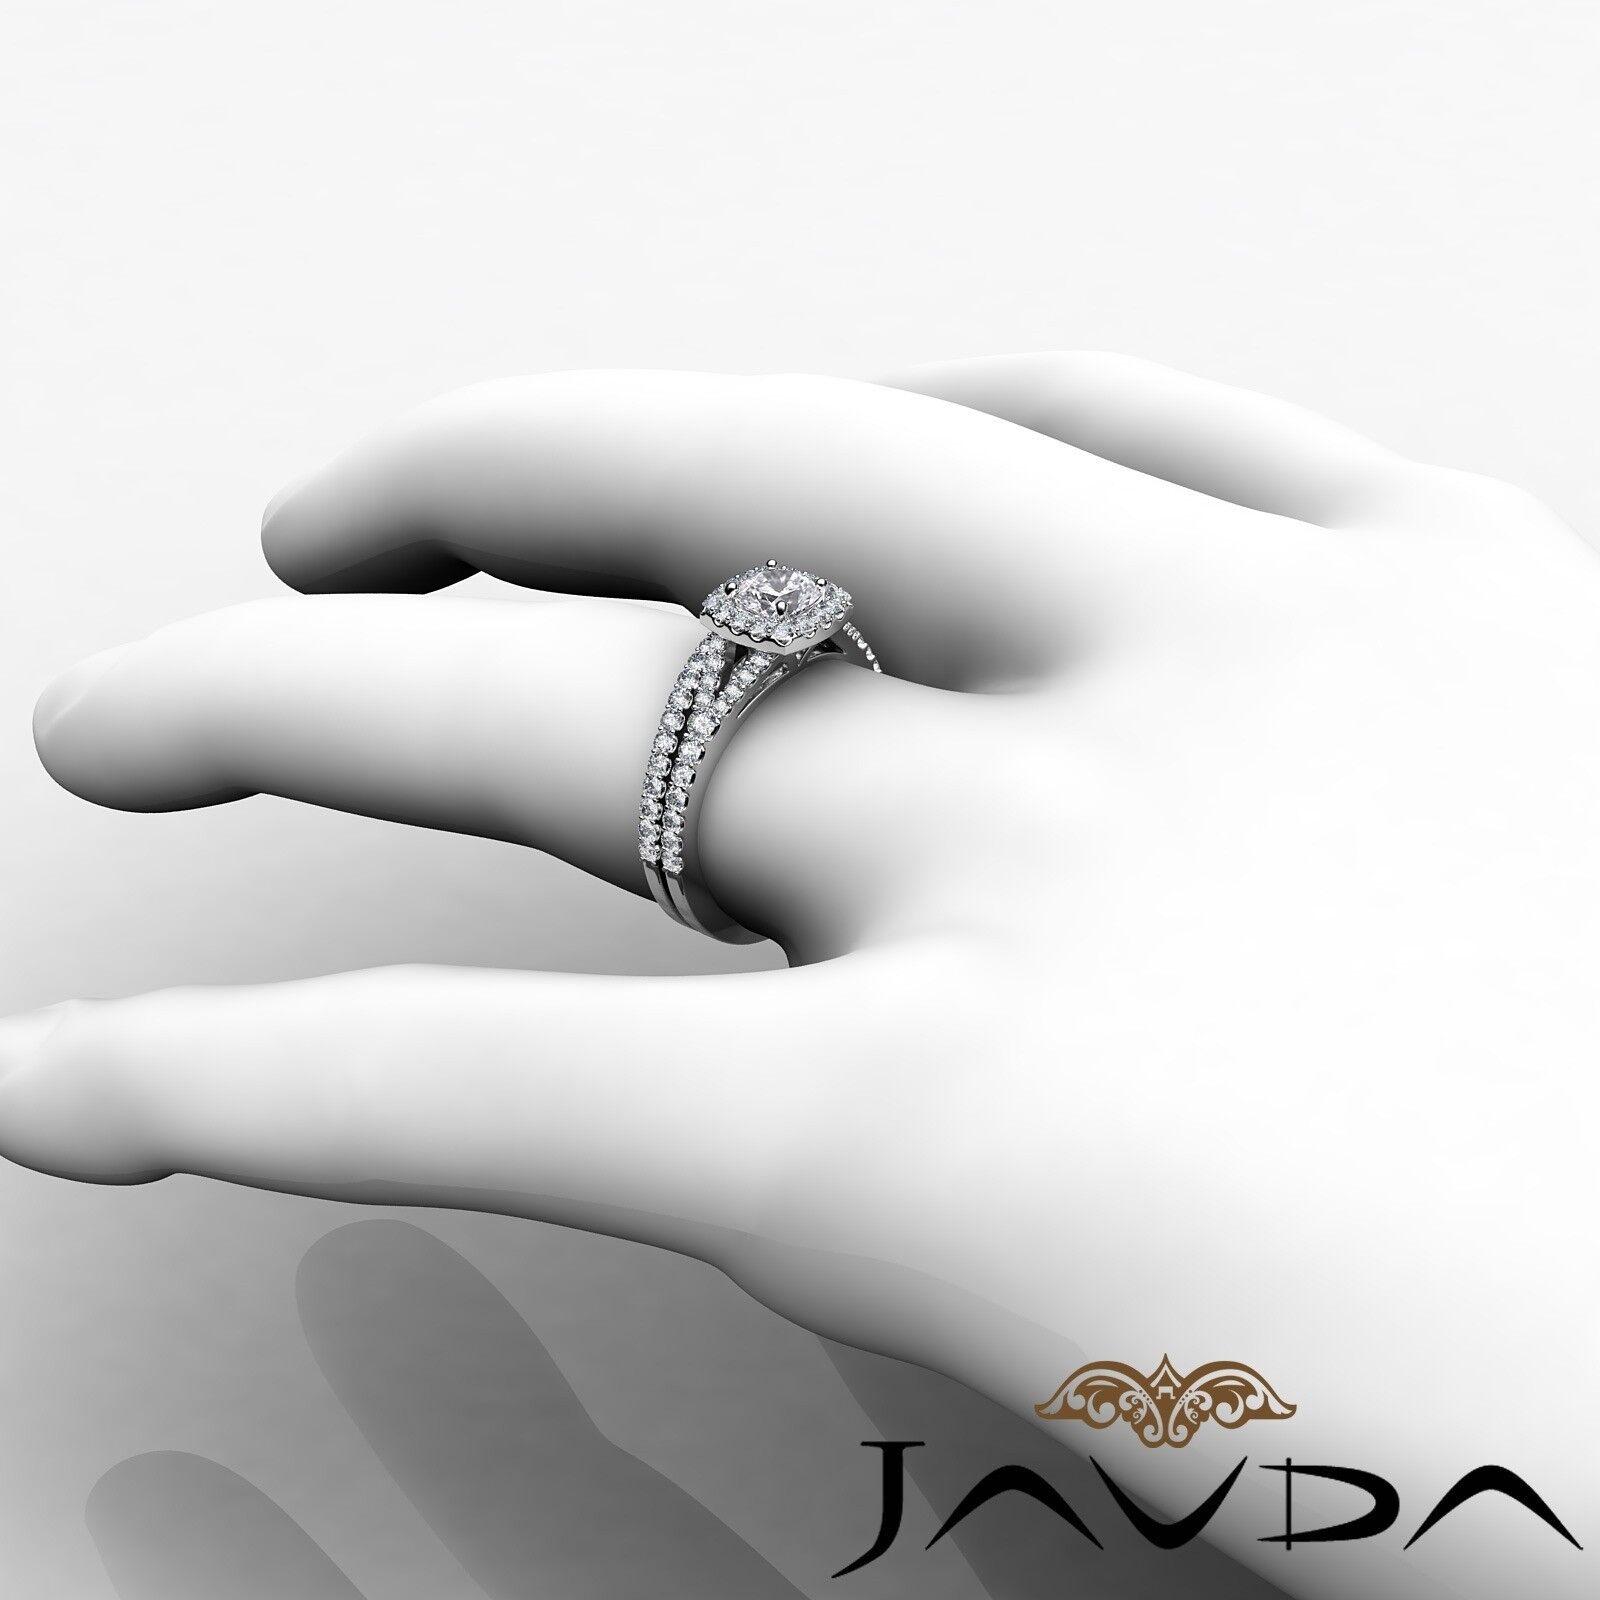 1.5ctw U Cut Pave Halo Bridal Cushion Diamond Engagement Ring GIA F-VS2 W Gold 5